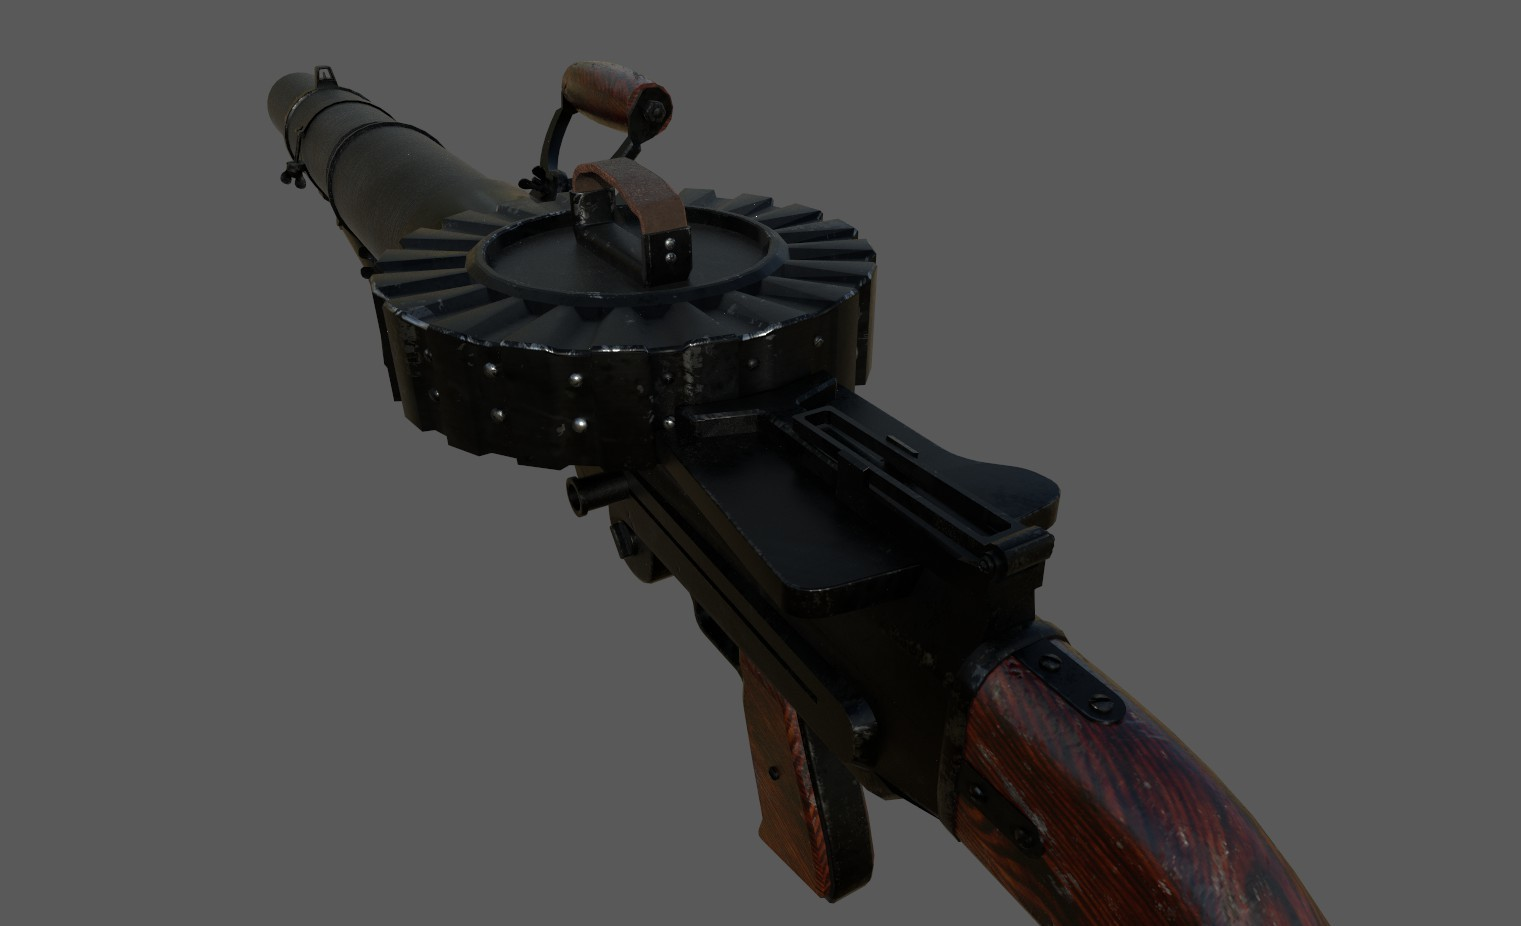 ArtStation - WW1 Lewis Machine Gun - Game Model, Phil Rowe